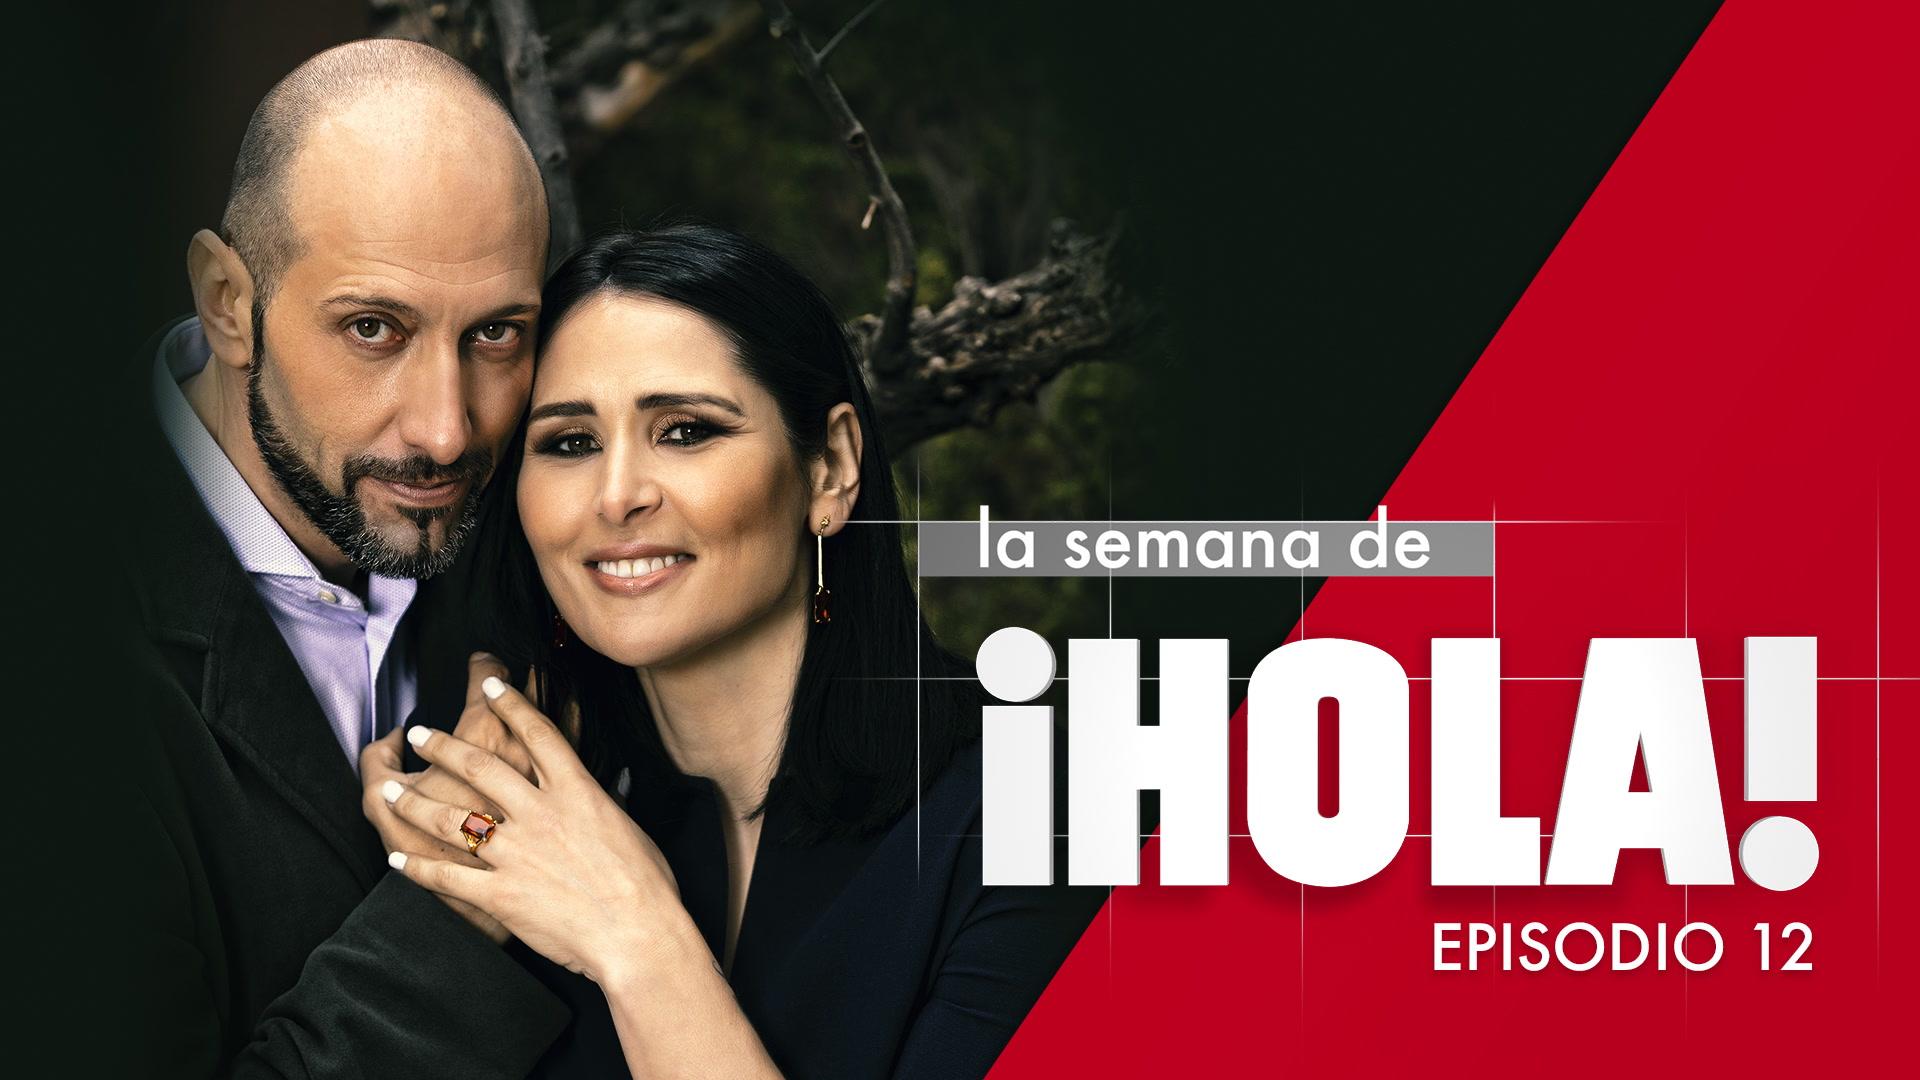 La semana de ¡HOLA! - Episodio 12